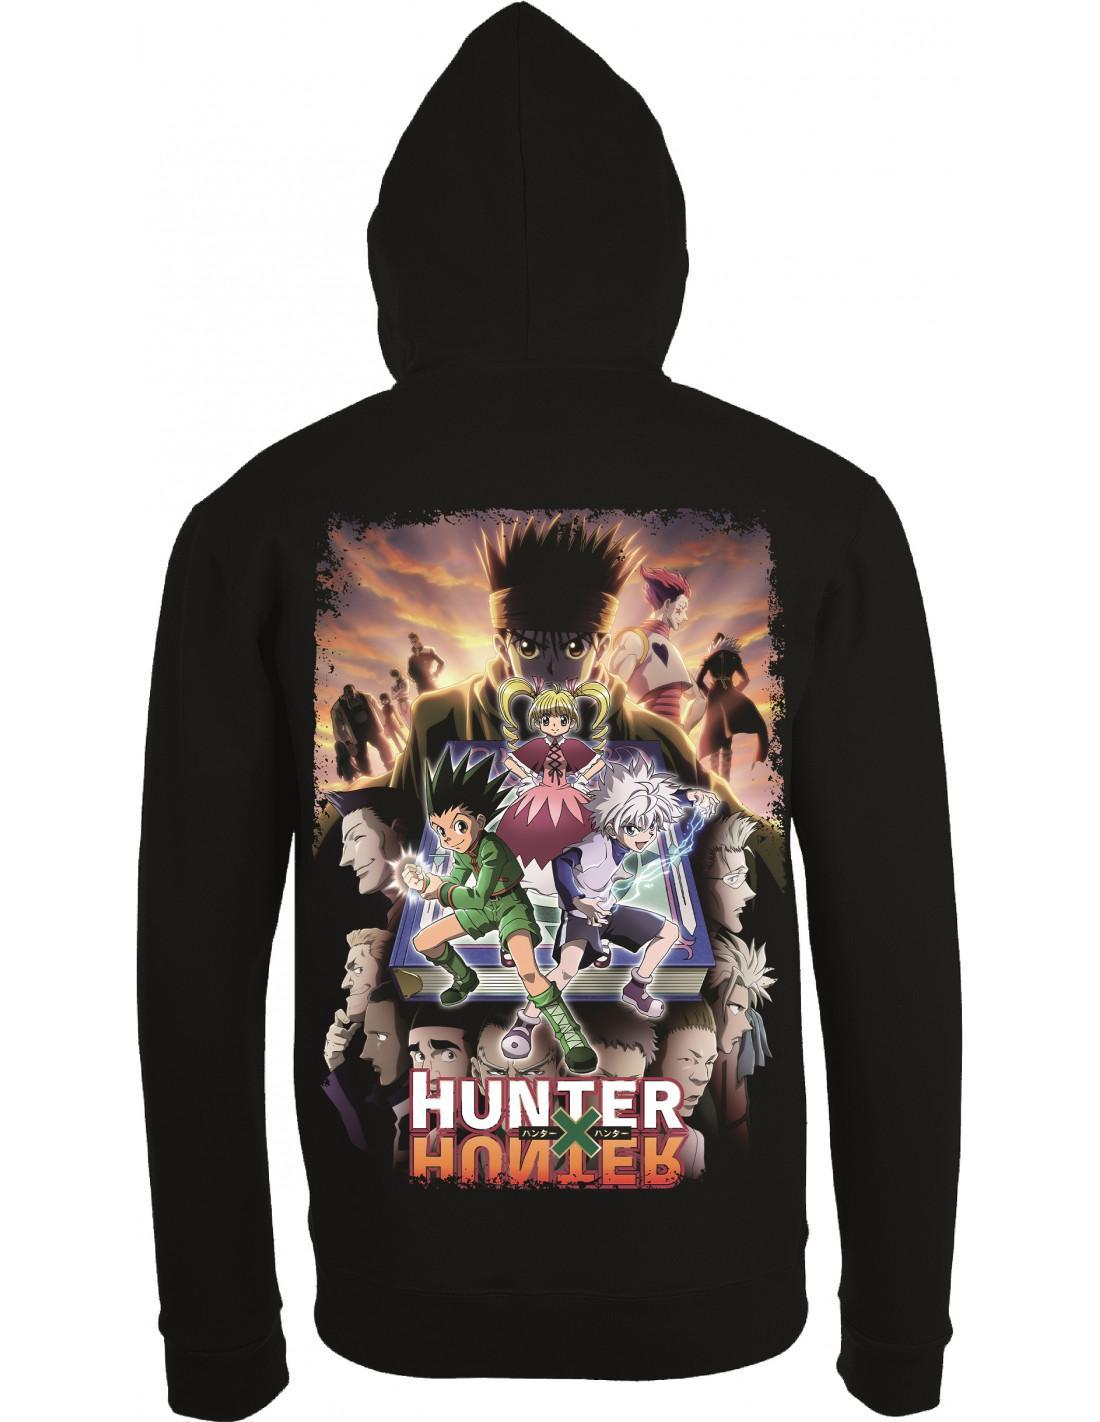 Sweat shirt hunter x hunter poster verso